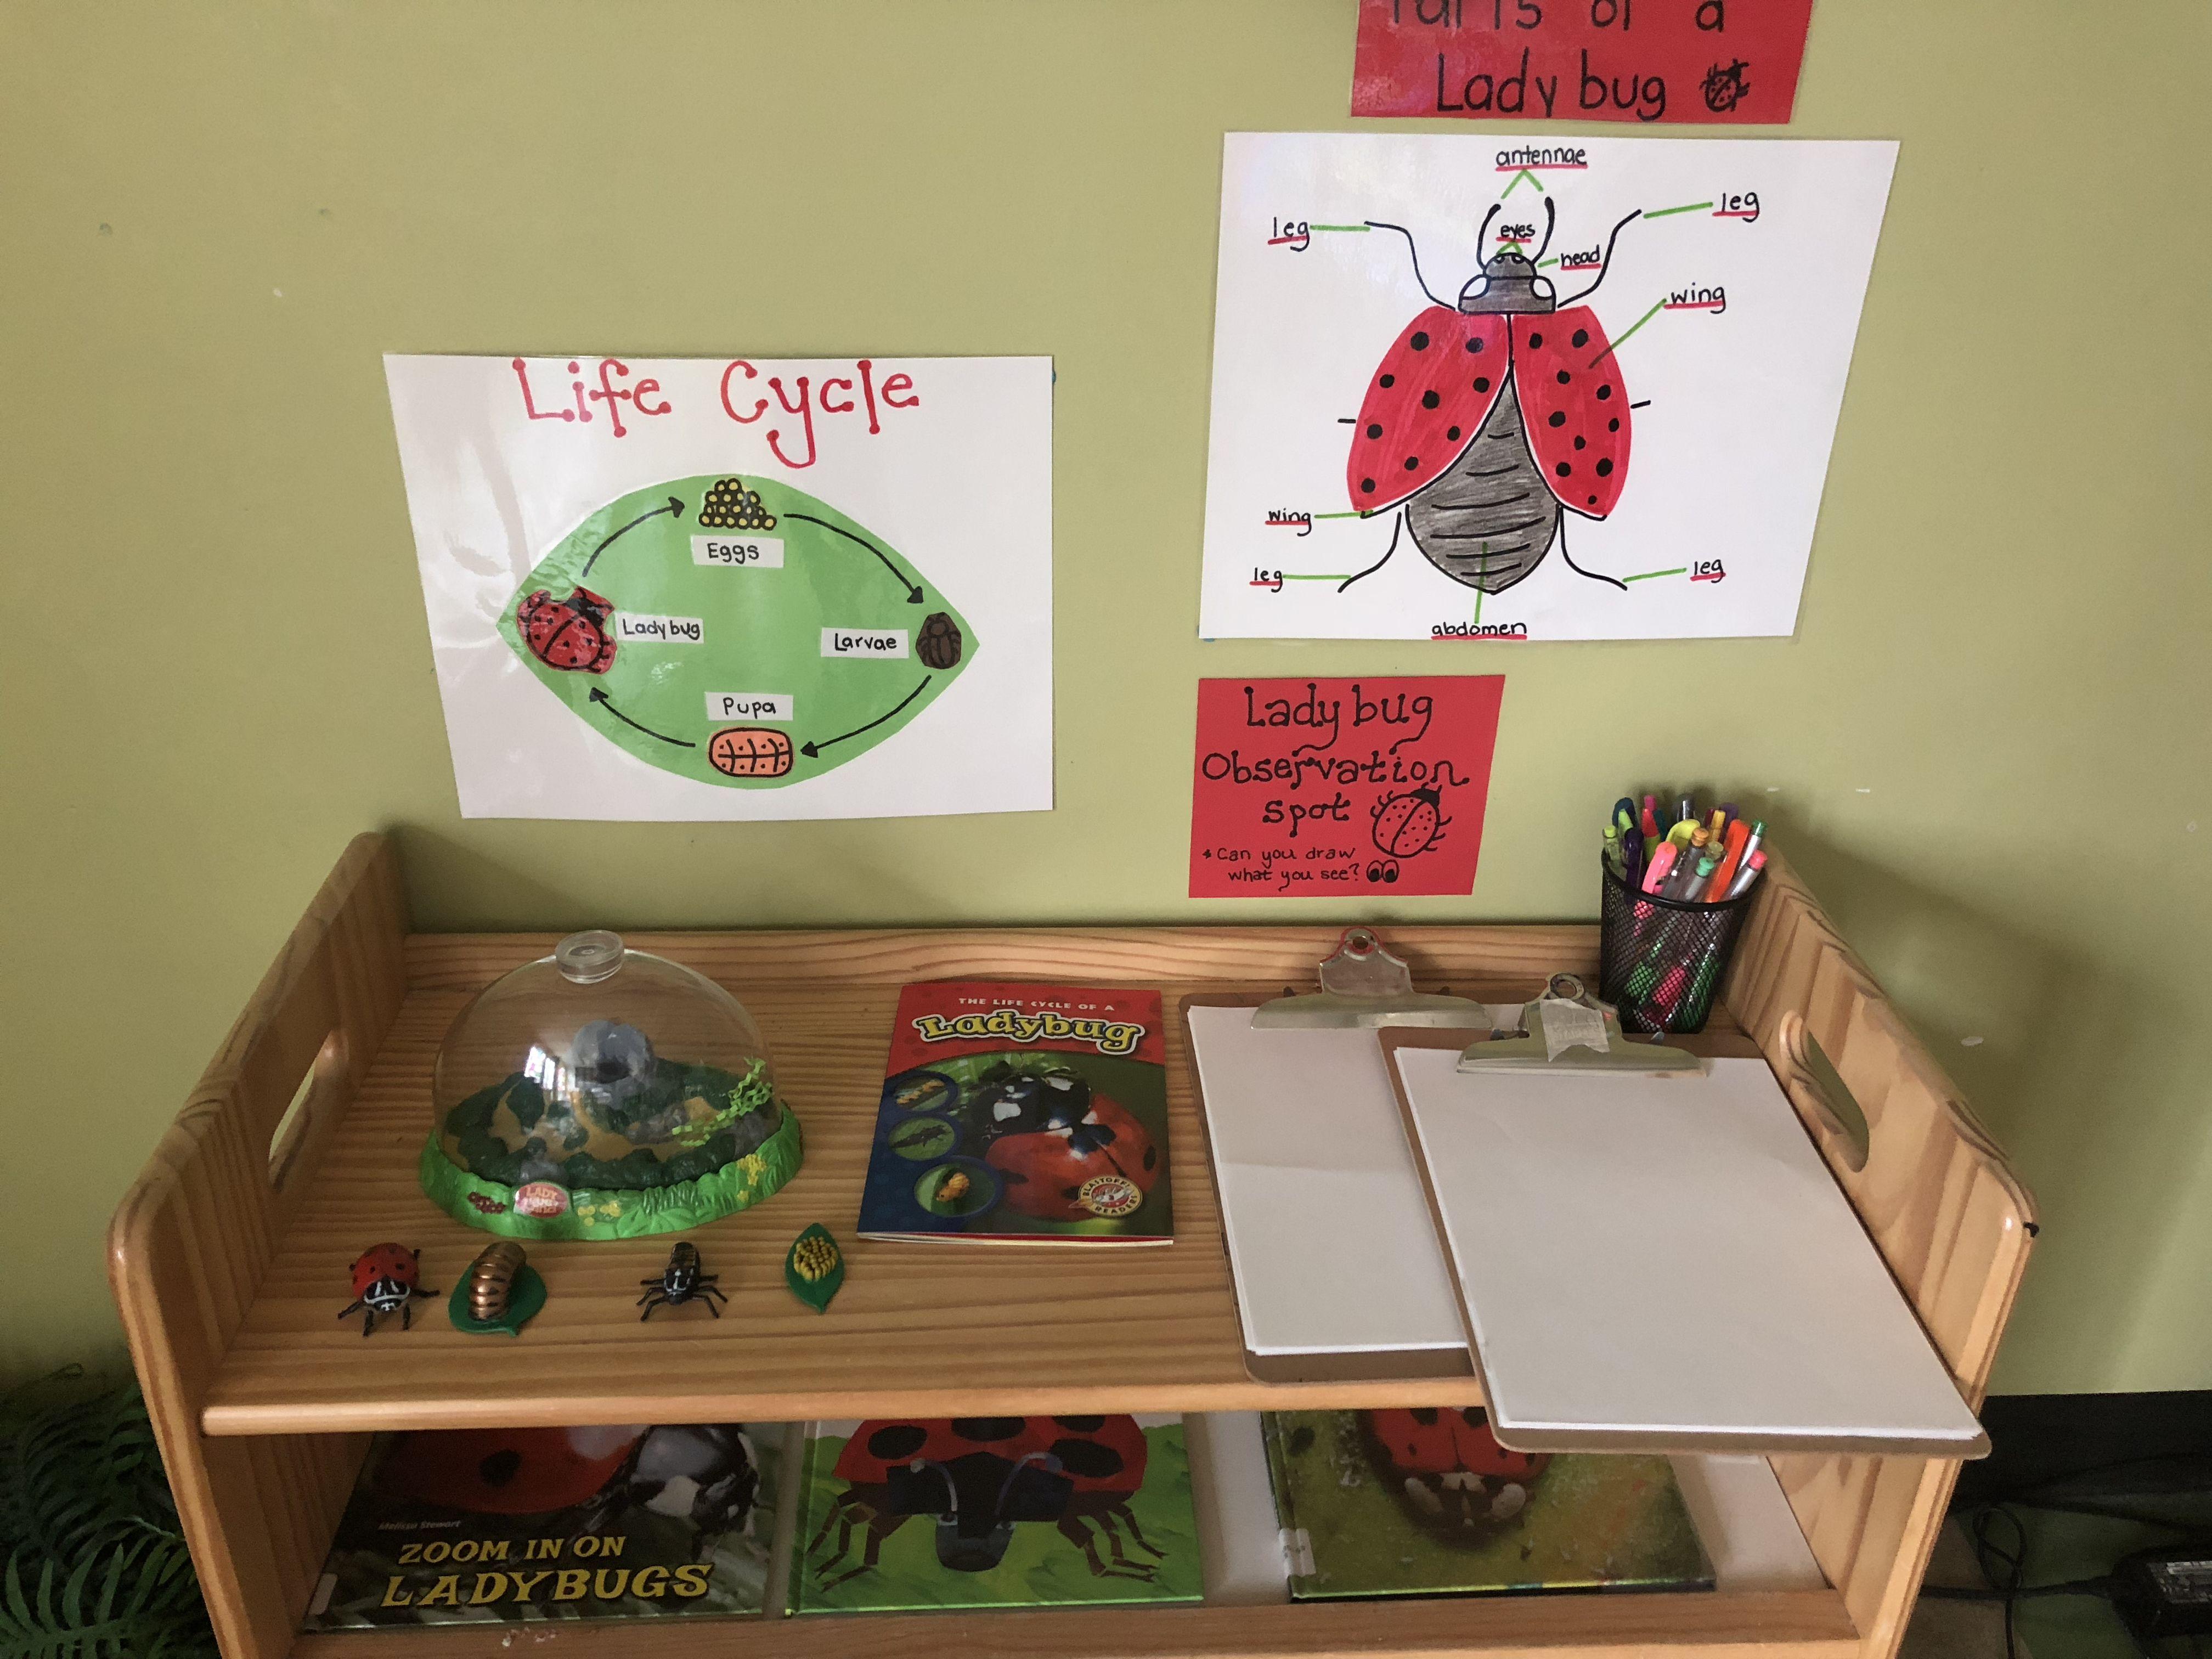 Ladybug Life Cycle Science Center With Real Ladybugs